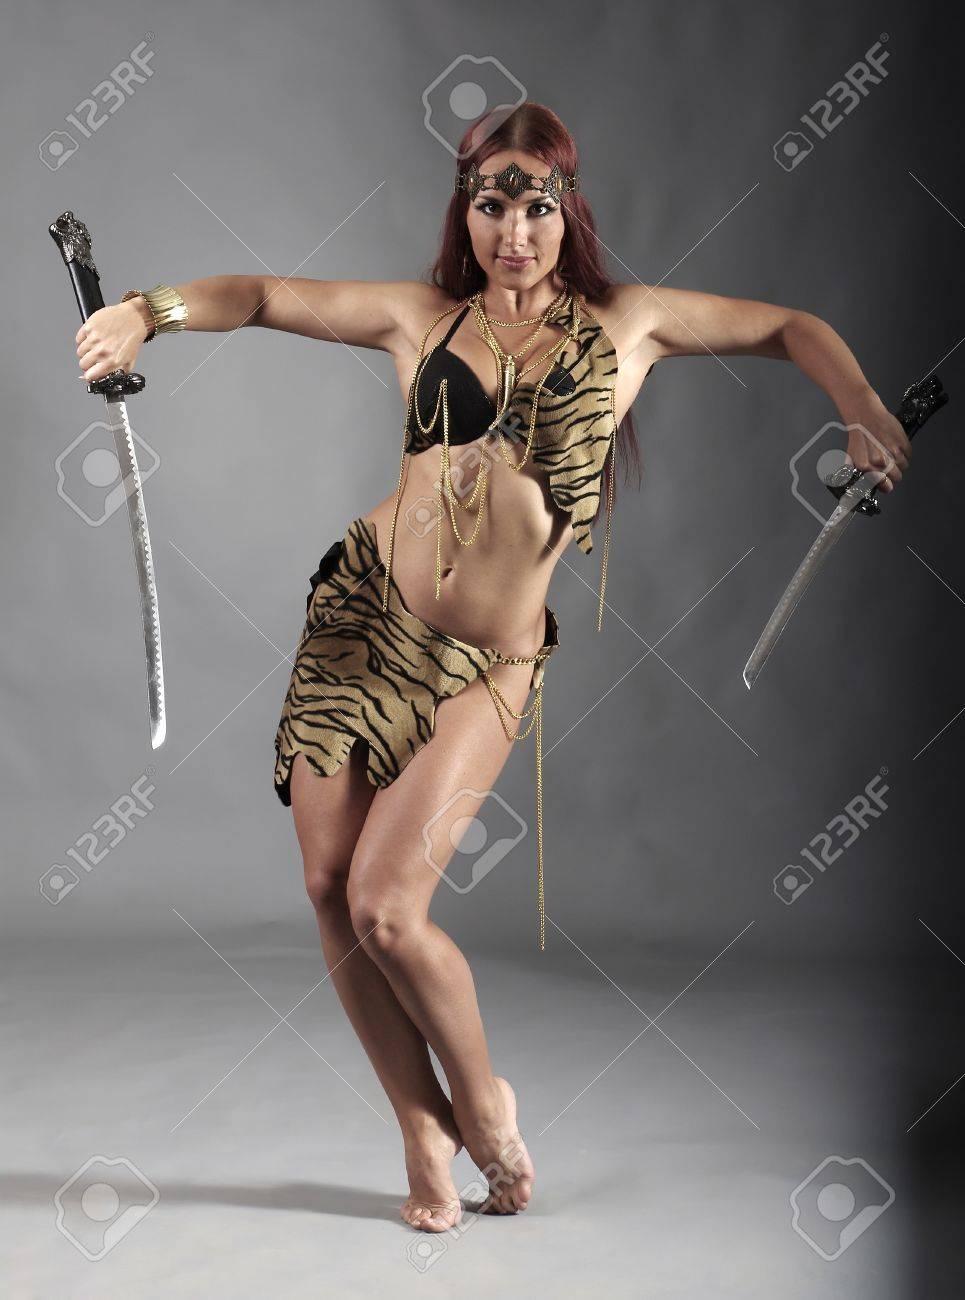 Warrior woman tgp nackt download